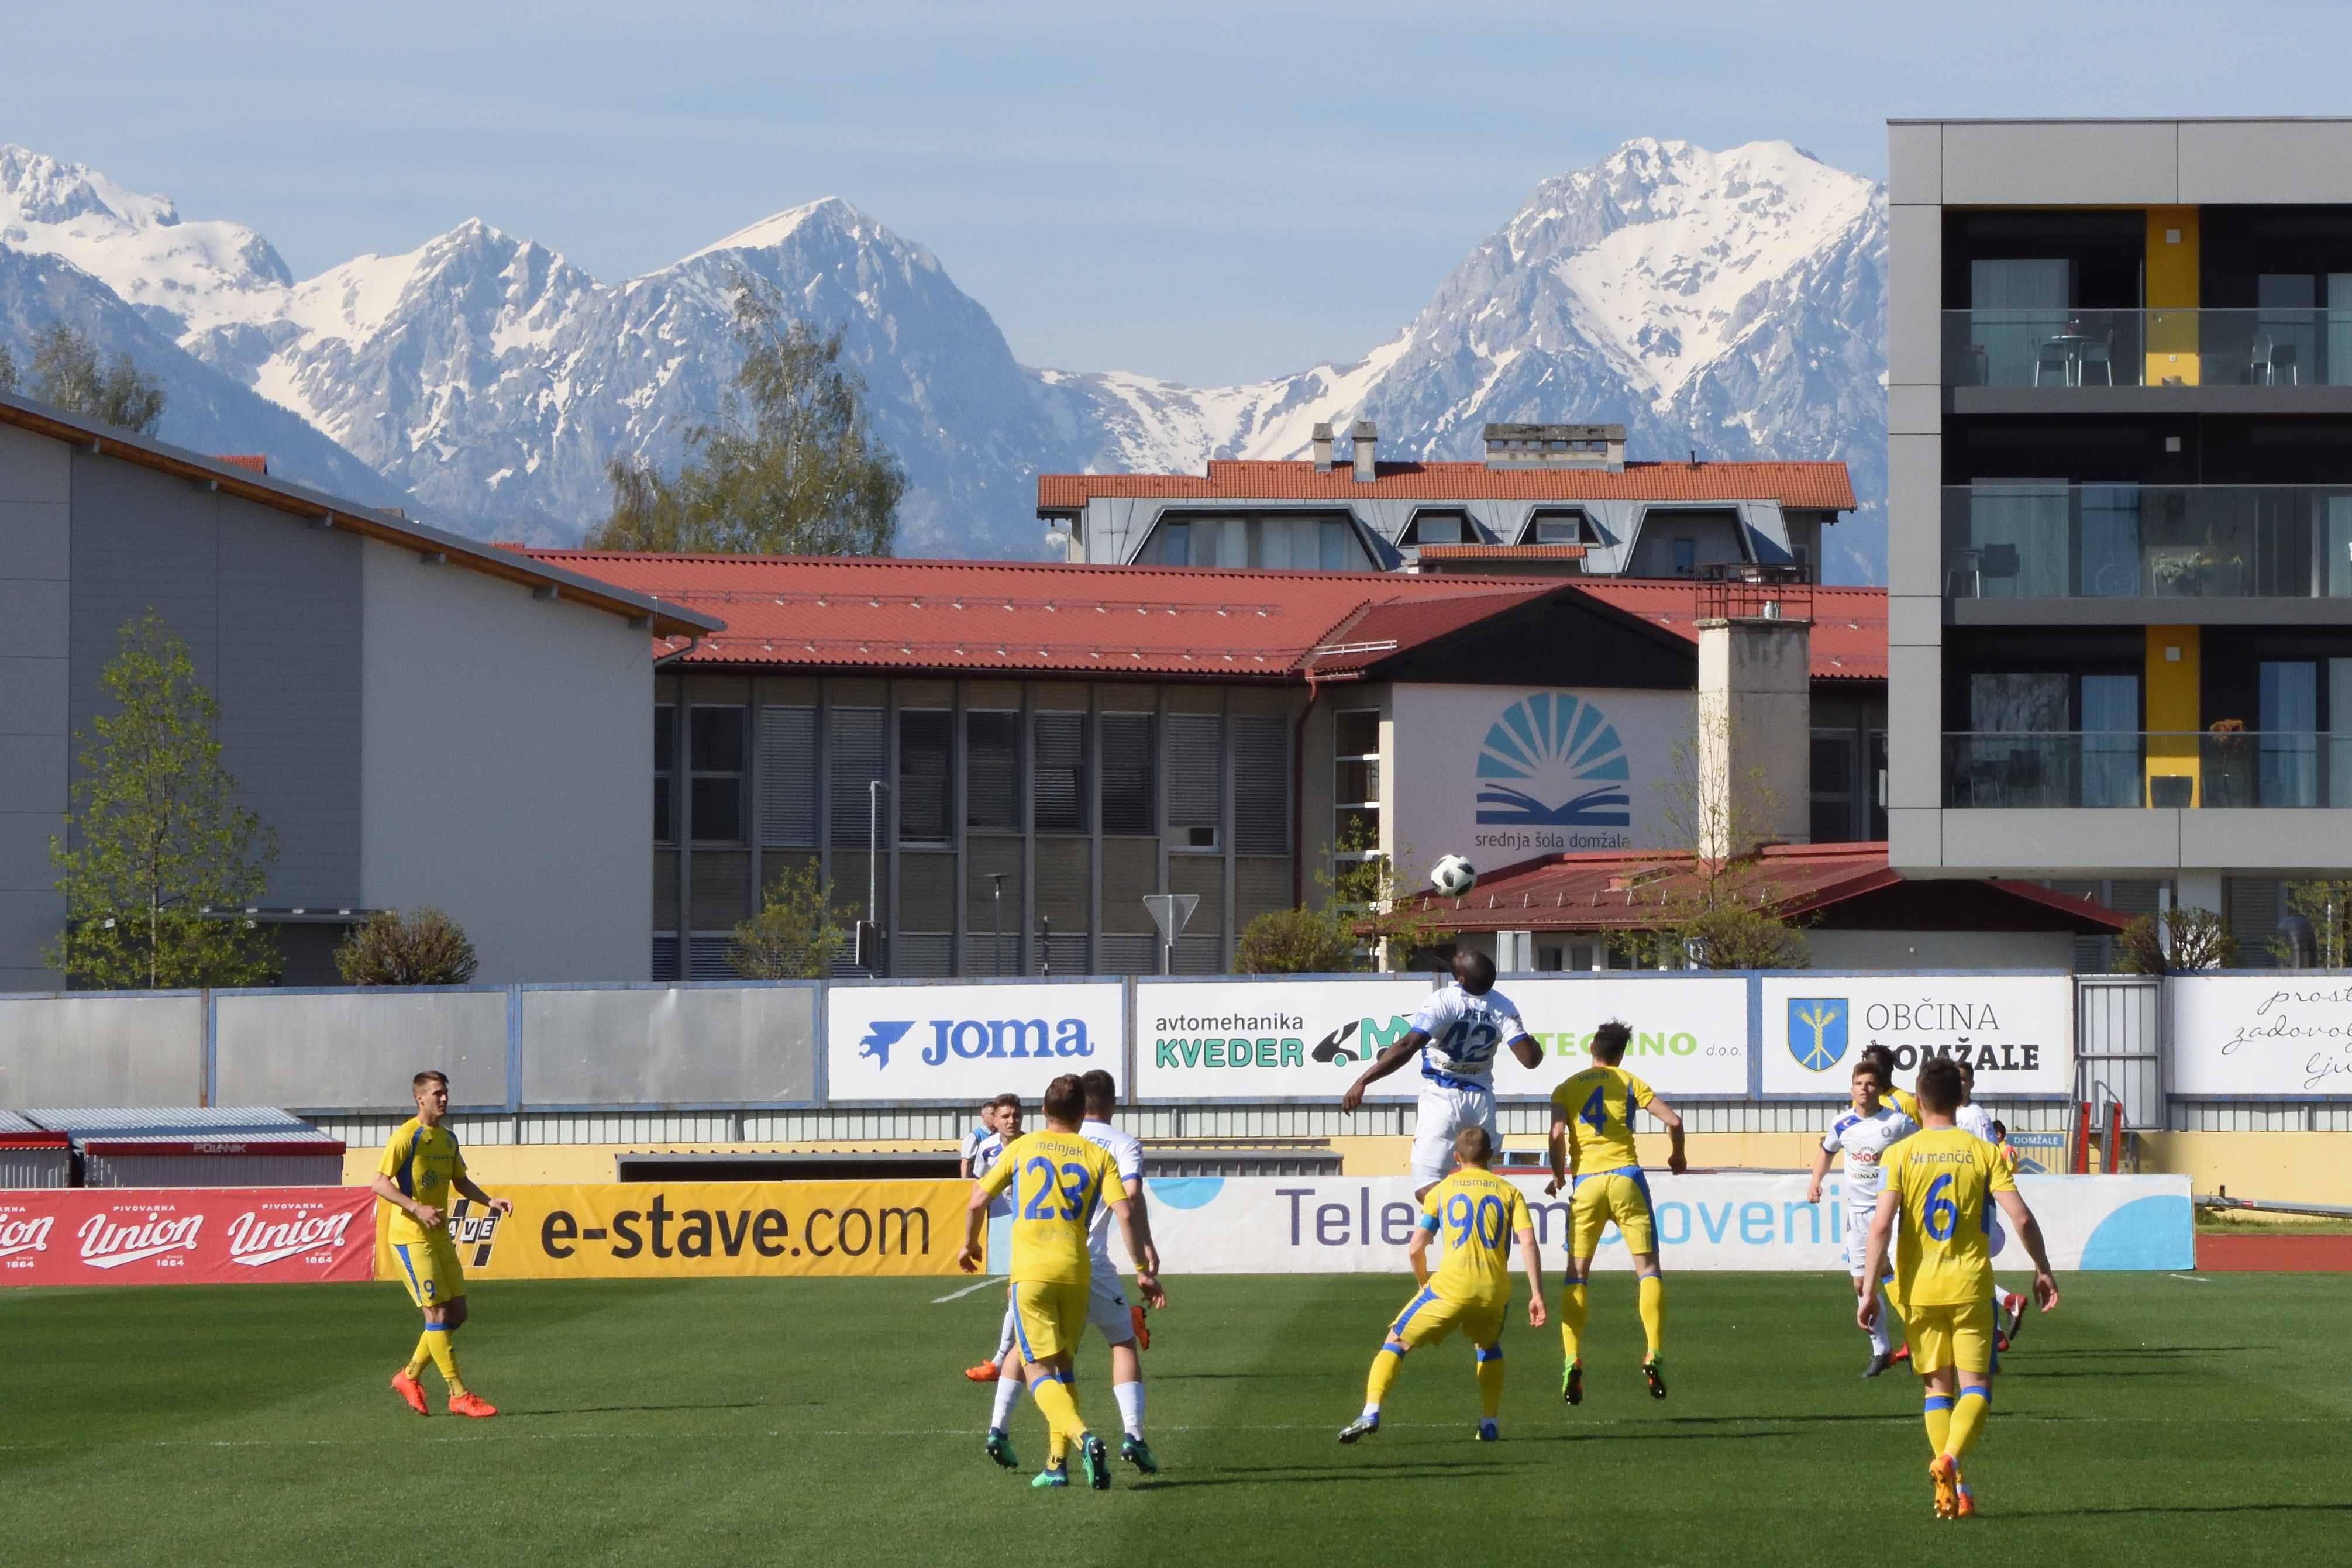 Football Nation 51/55 - Slovenia - Domžale 1-0 Celje